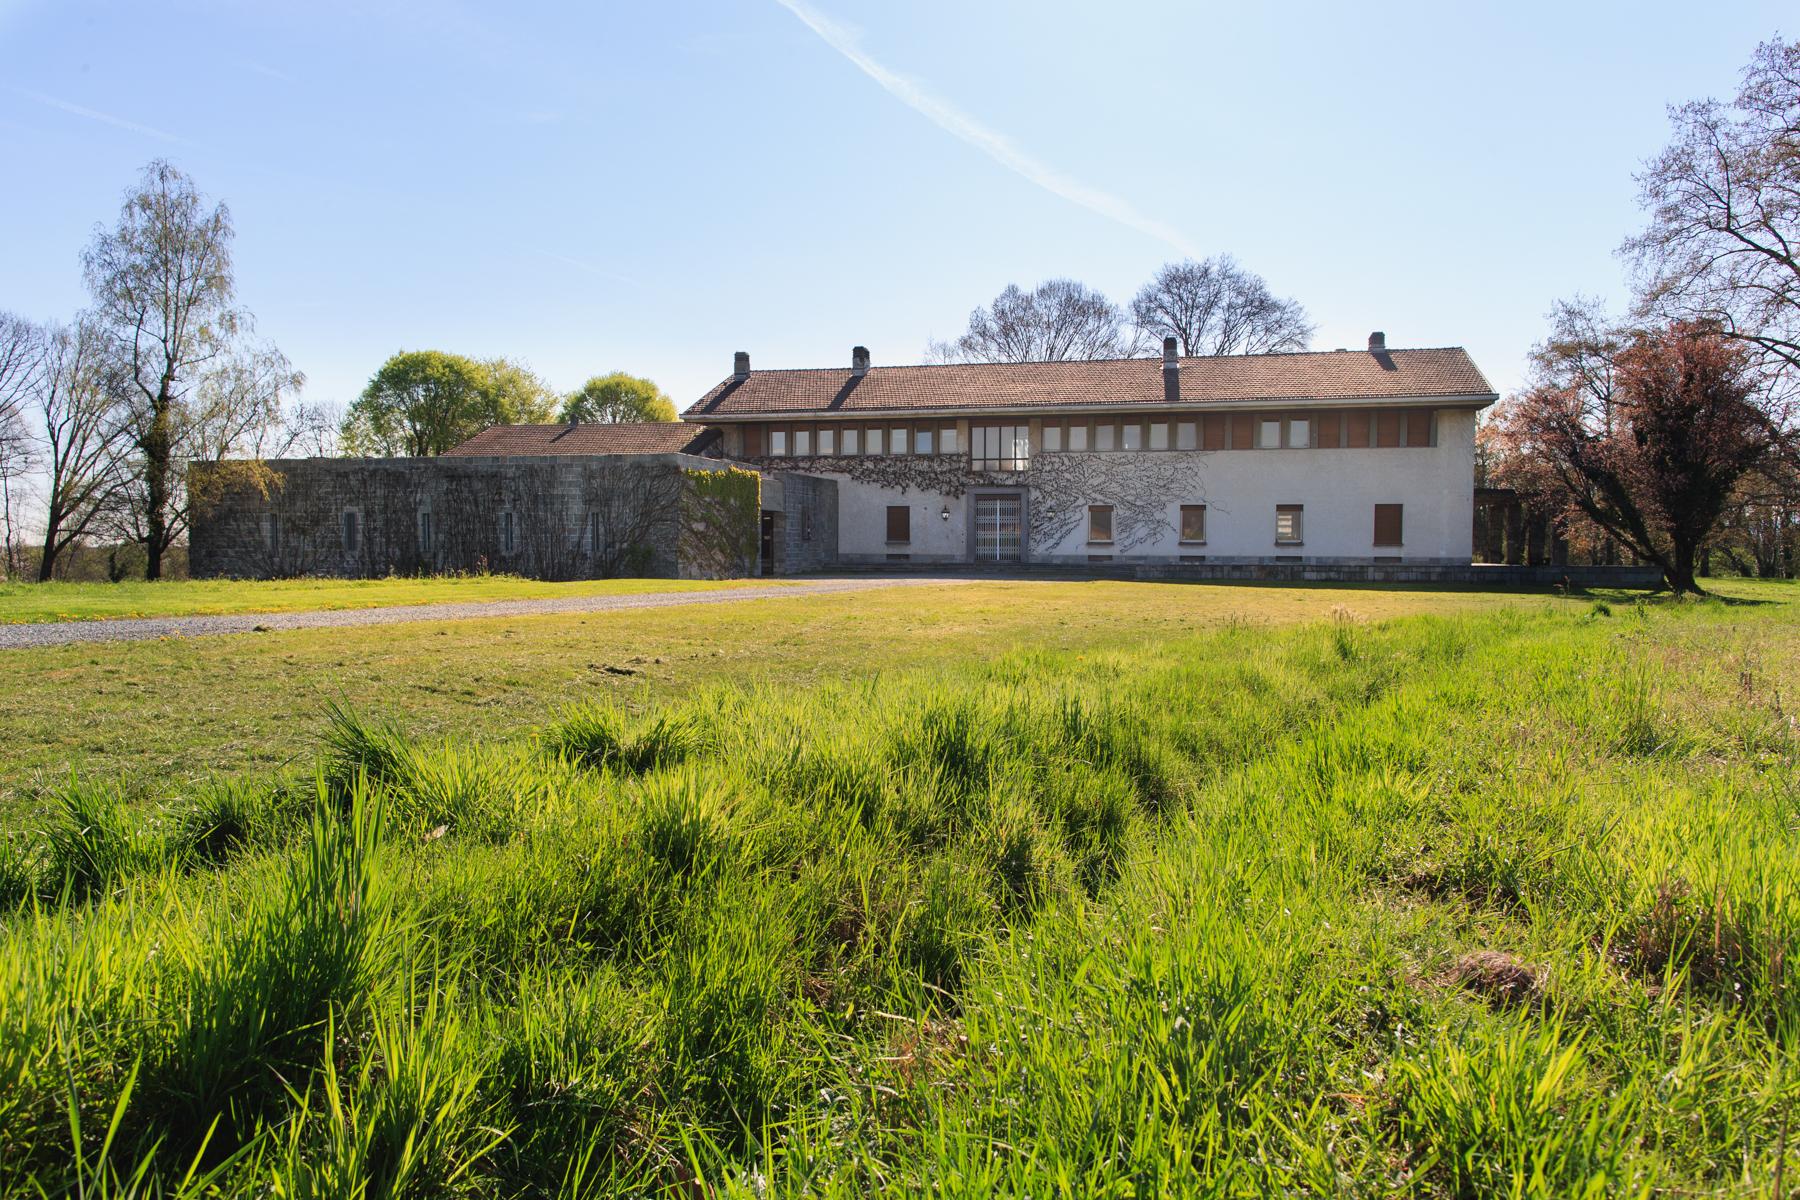 Casa indipendente in Vendita a Venaria: 5 locali, 1000 mq - Foto 6